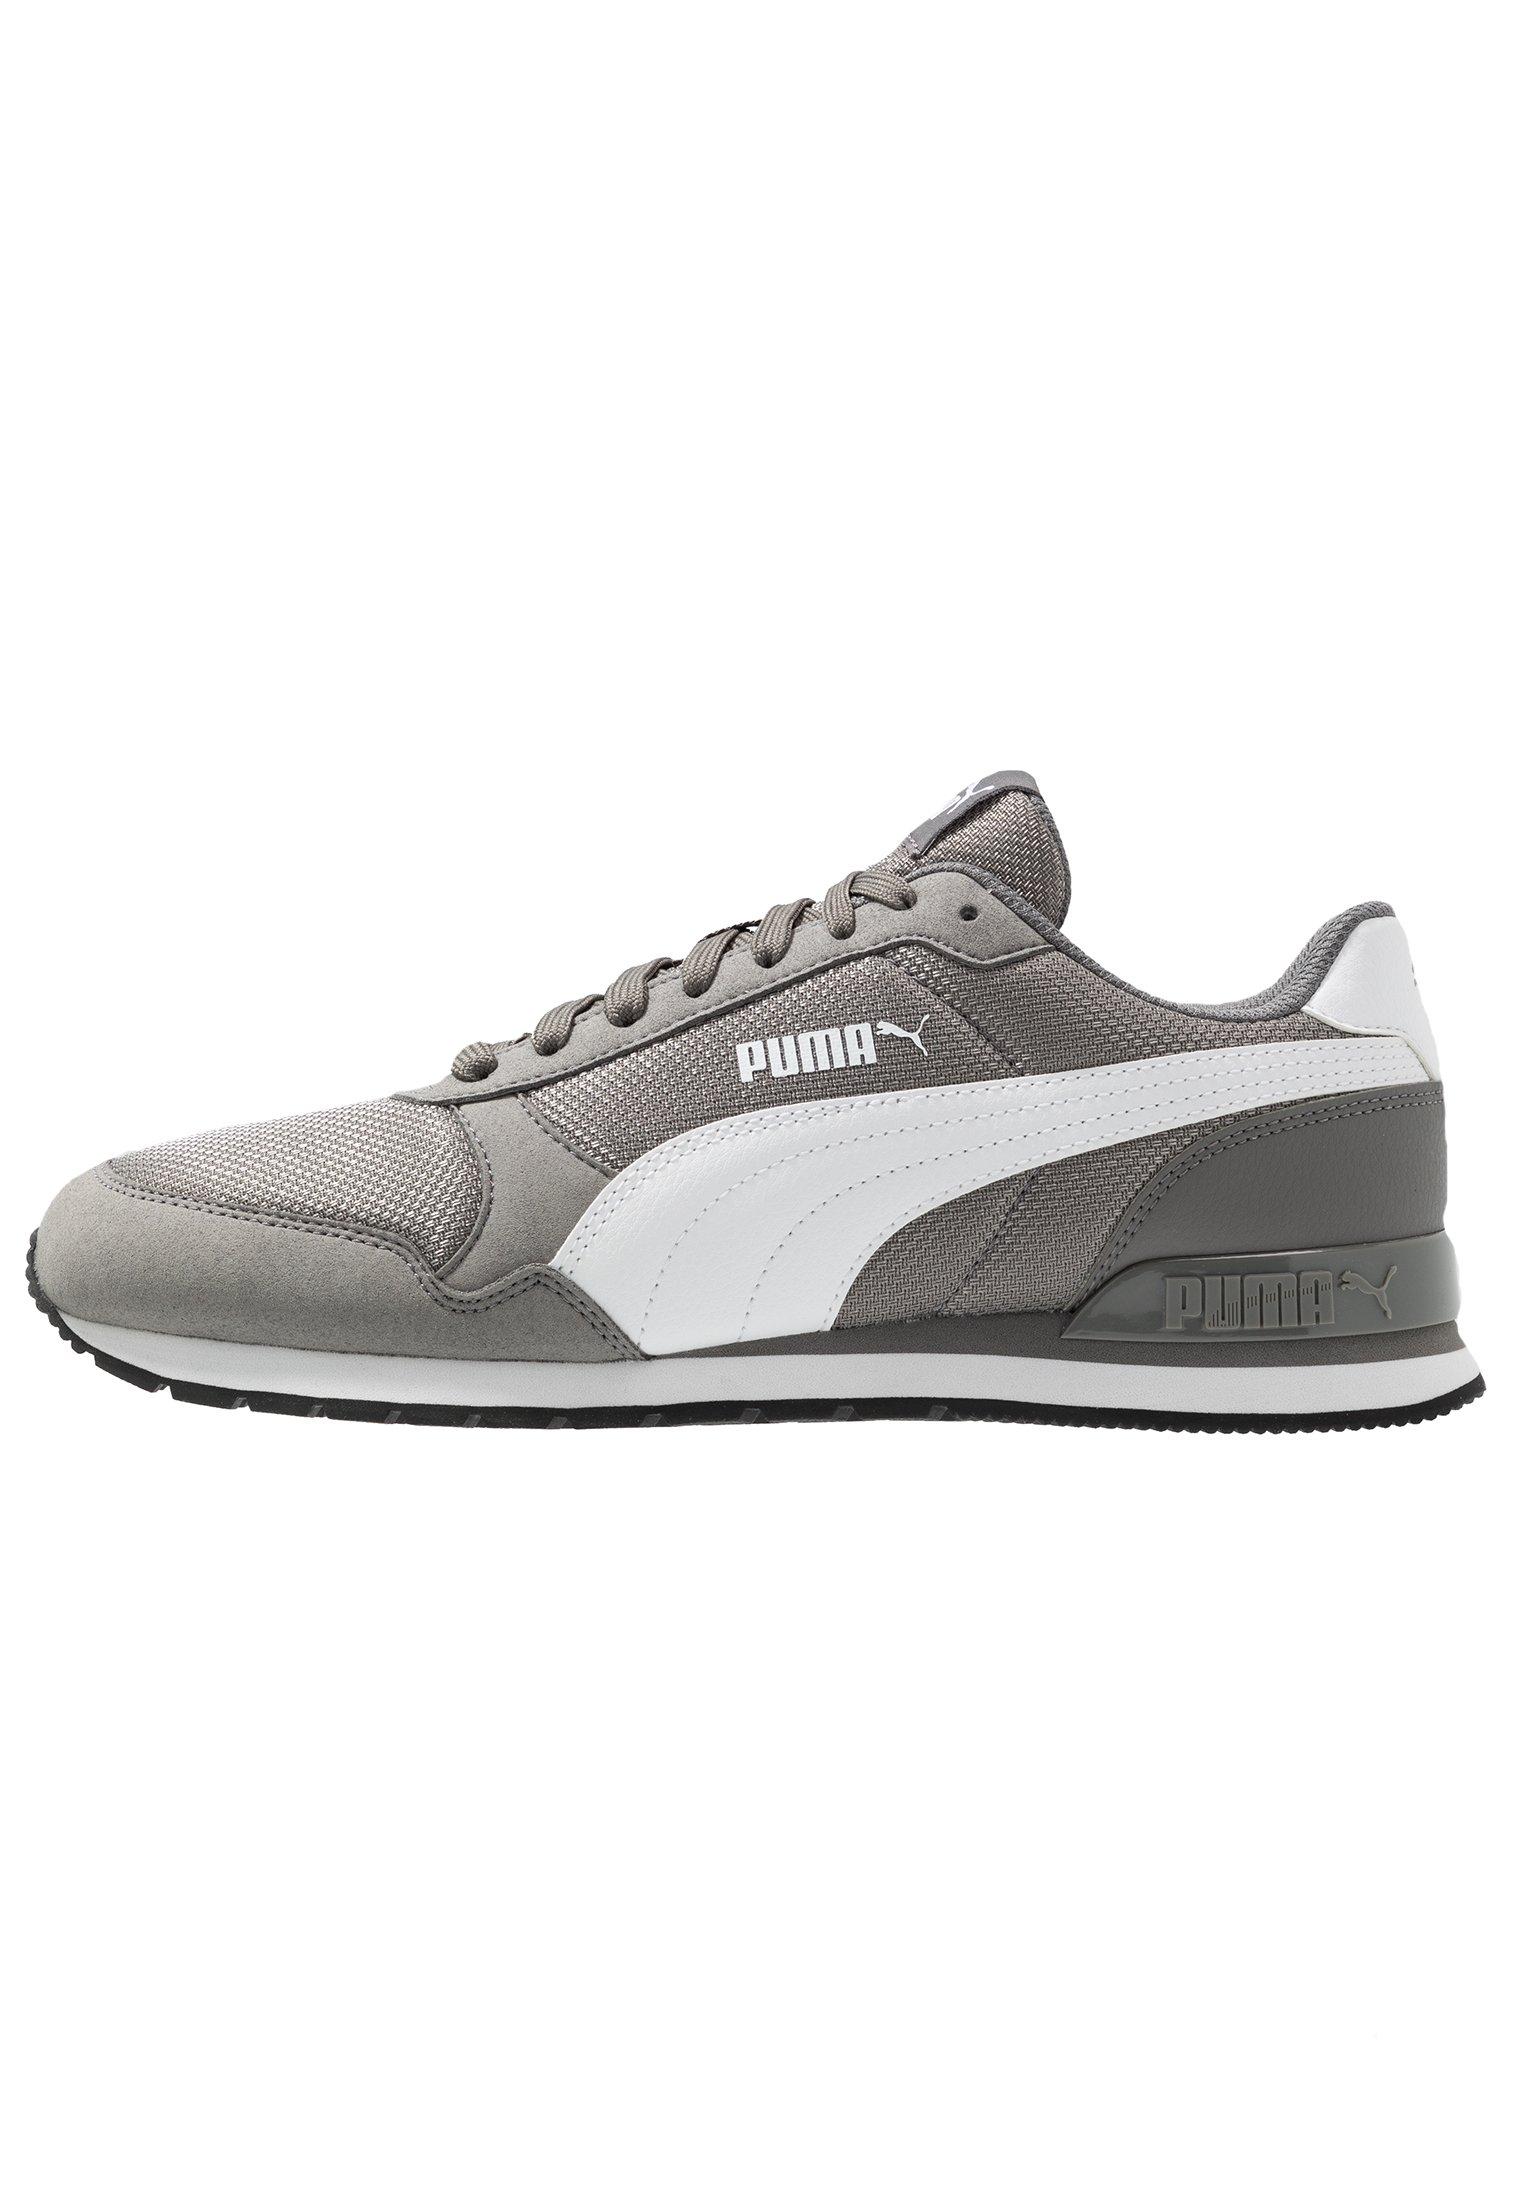 Puma Sneakers basse p.black p. white strong blue Zalando.it